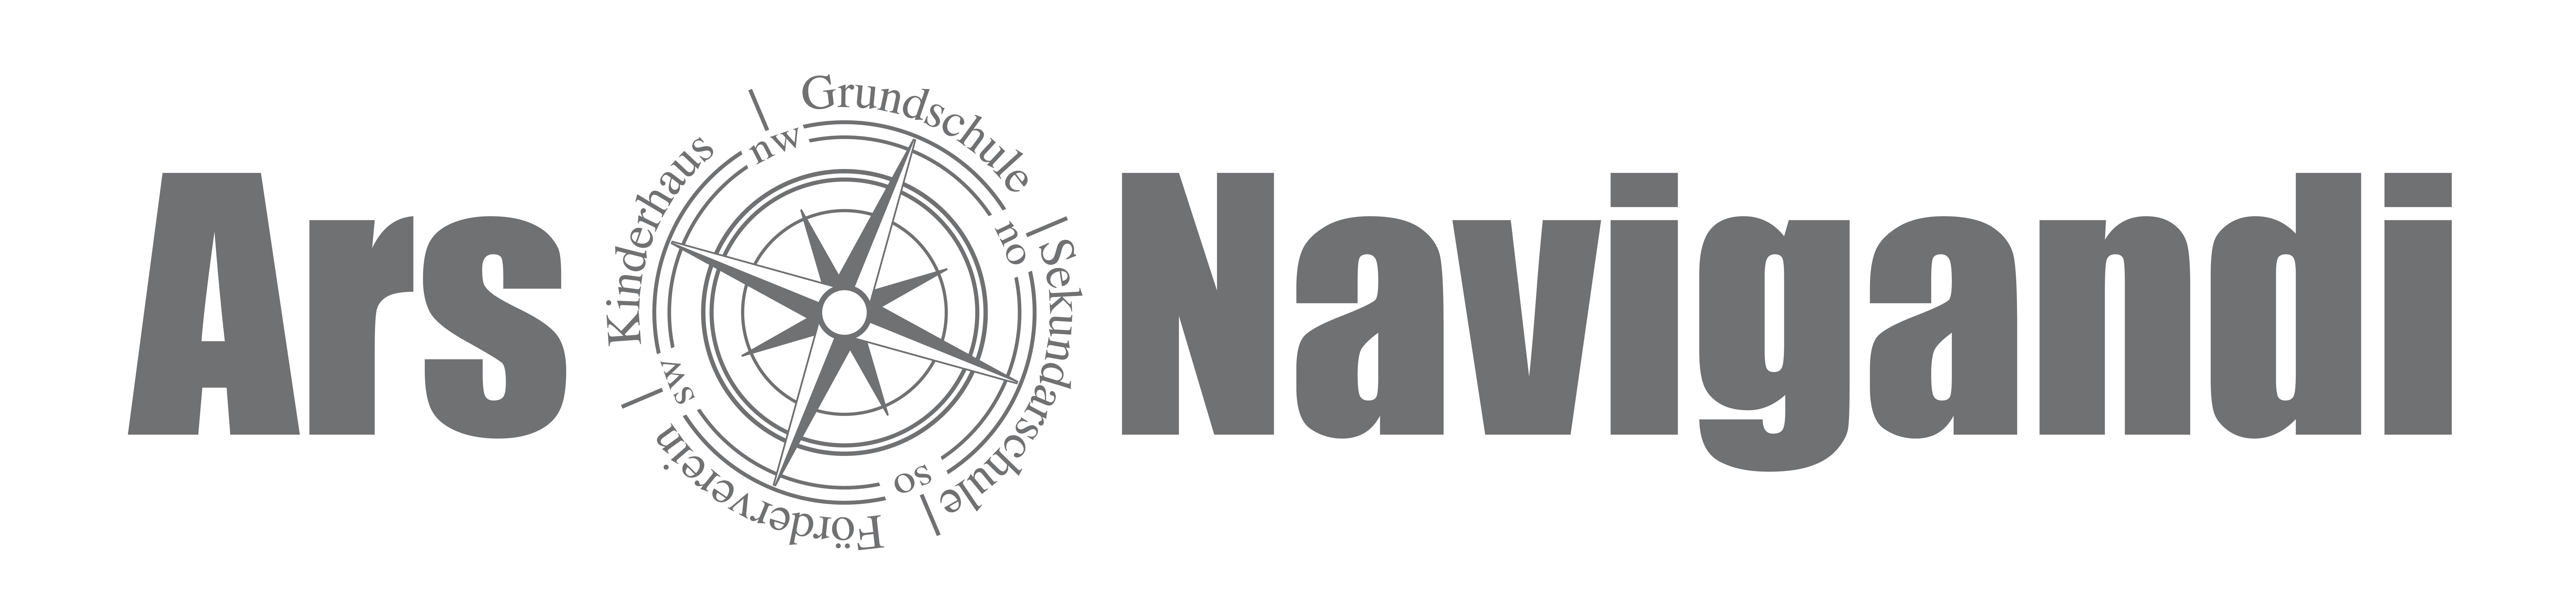 Ars Navigandi